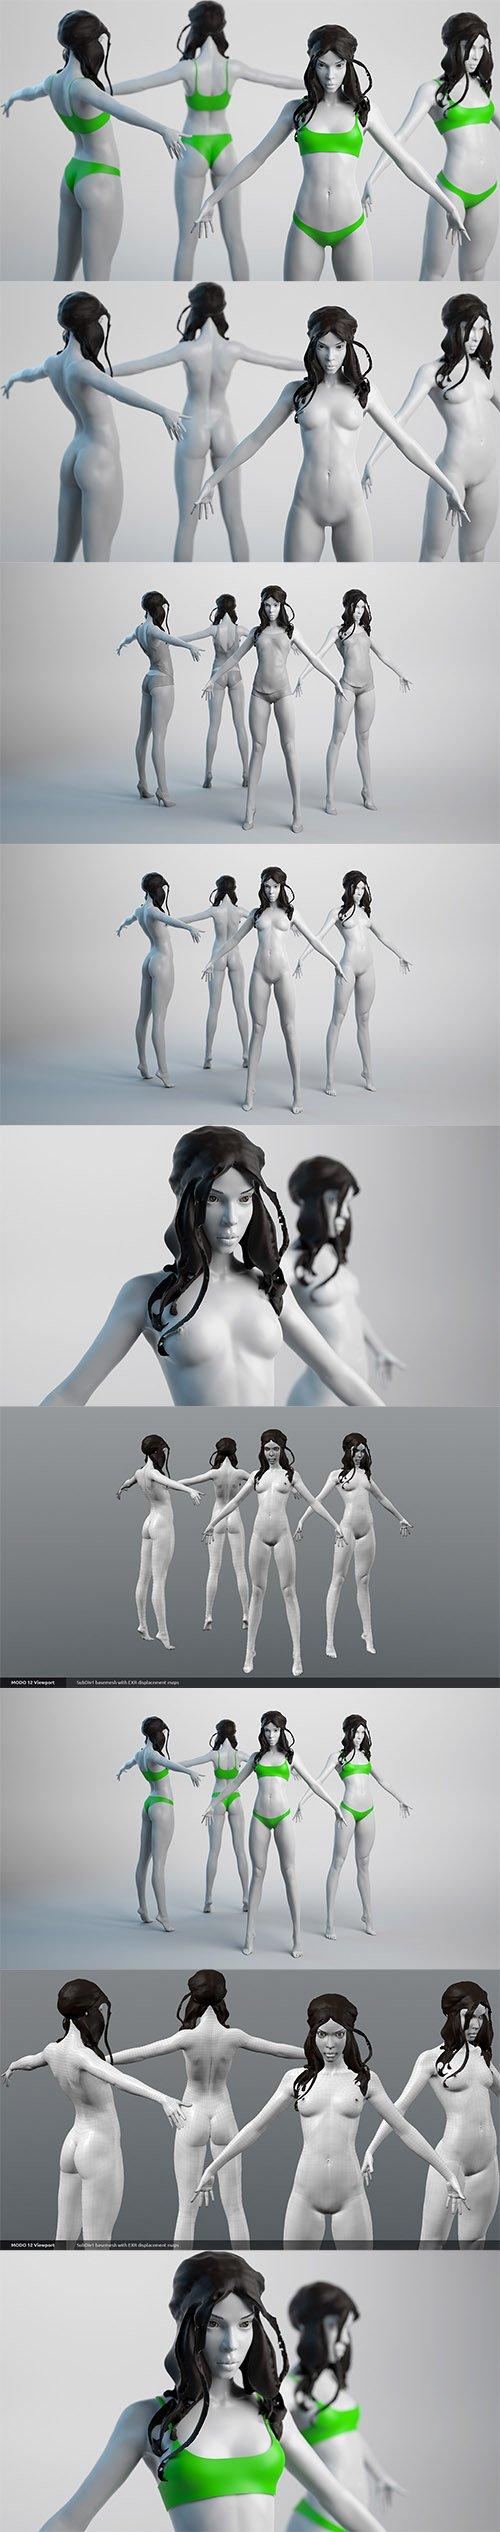 Cubebrush - Female Basemesh 04